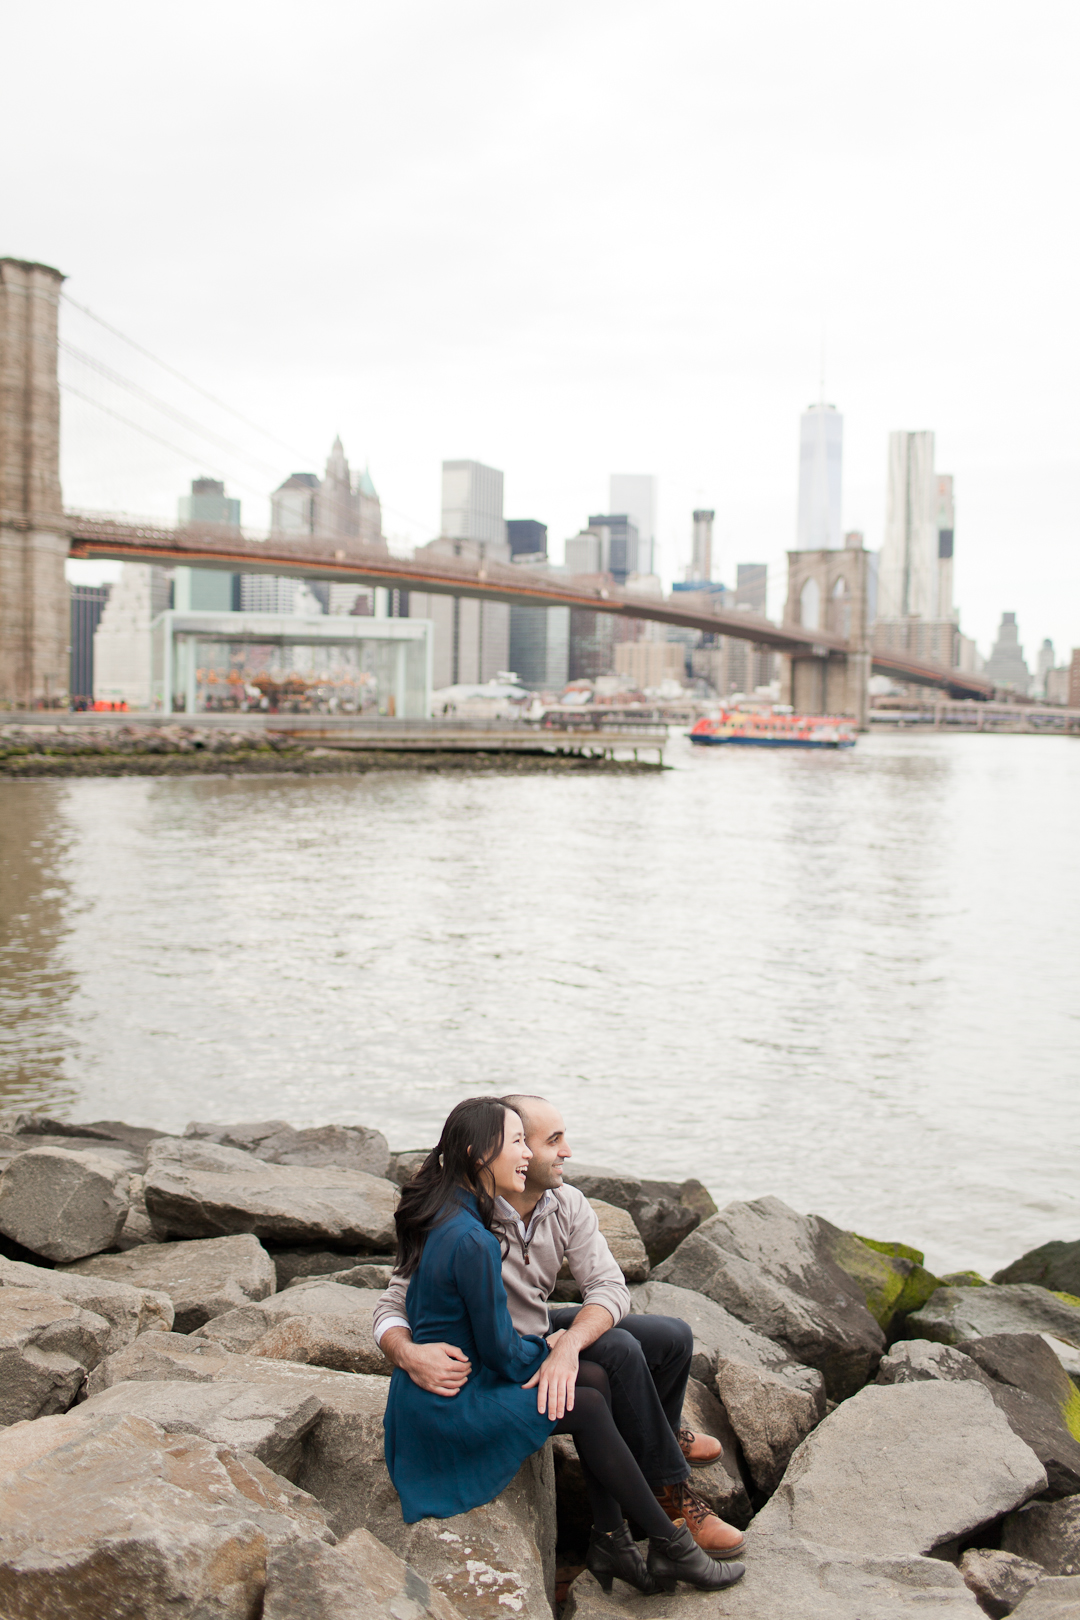 Melissa Kruse Photography - Kristine & David Engagement Photos-16.jpg